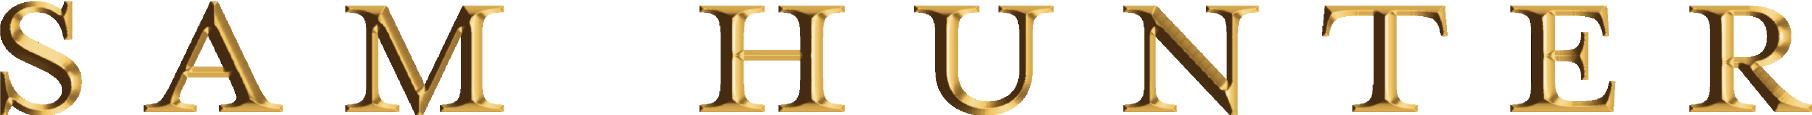 Sam Hunter logo